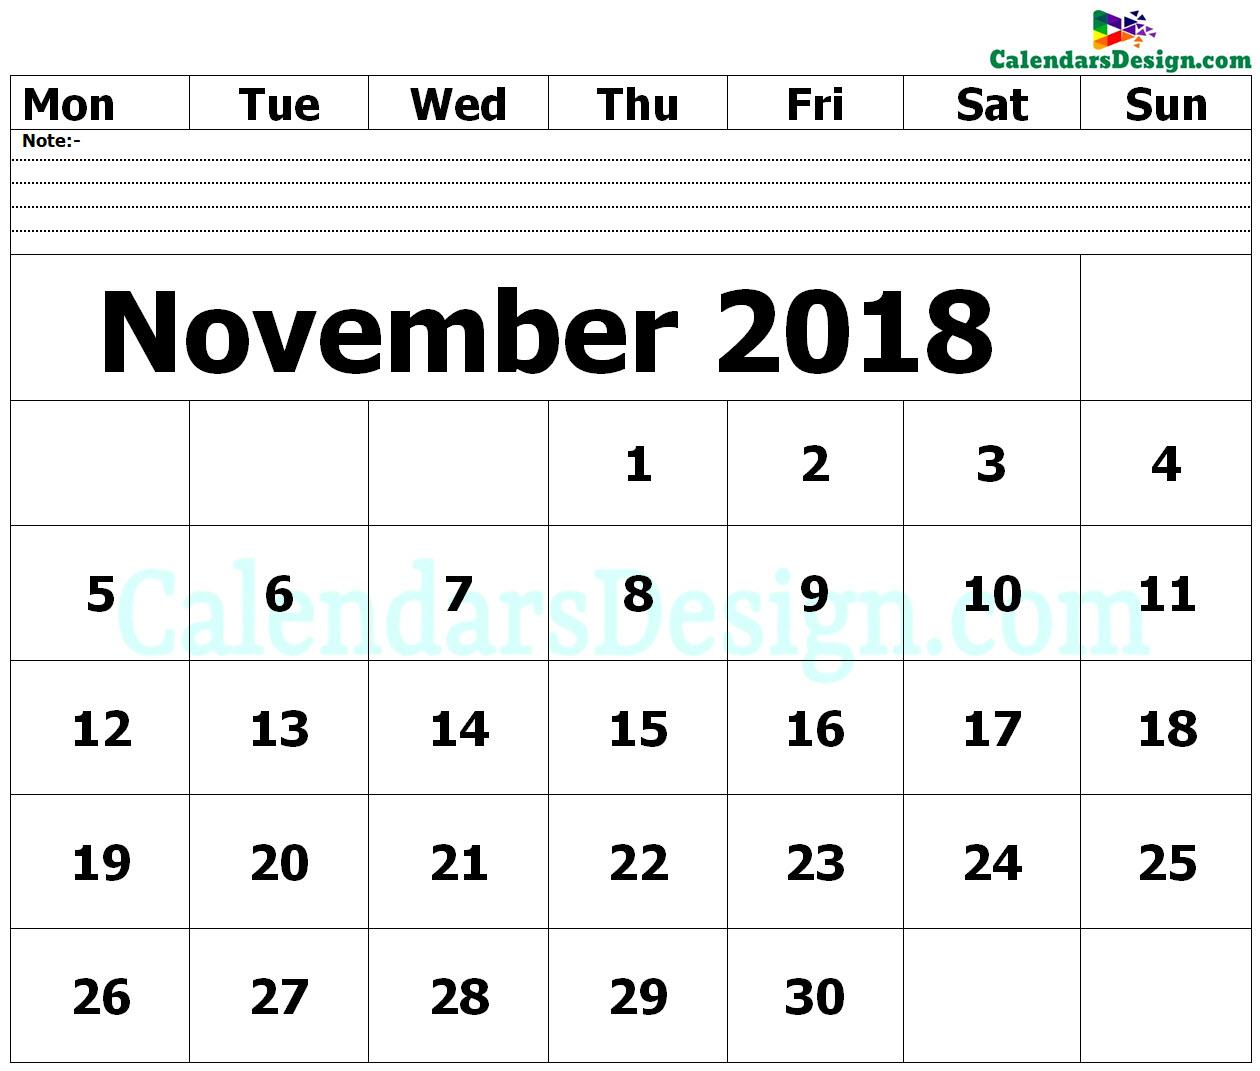 Editable November 2018 Calendar Blank Template - Free 2019 Printable with regard to November Calendar Templates Editable